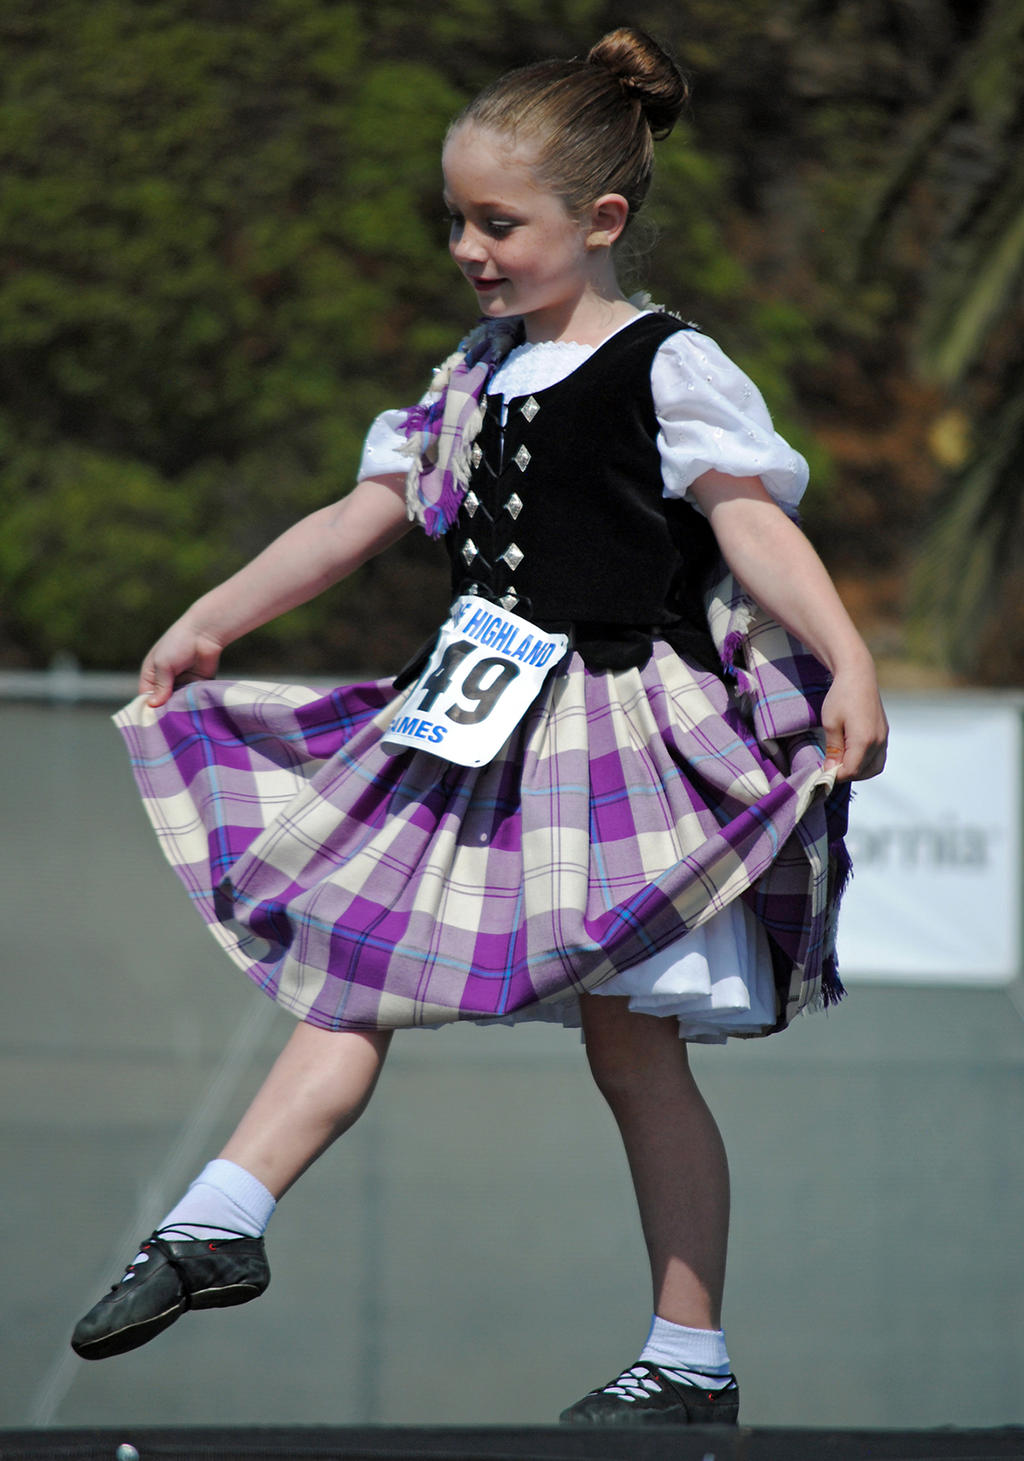 Lormet_Cultural-Dancer-0369sml by Lormet-Images